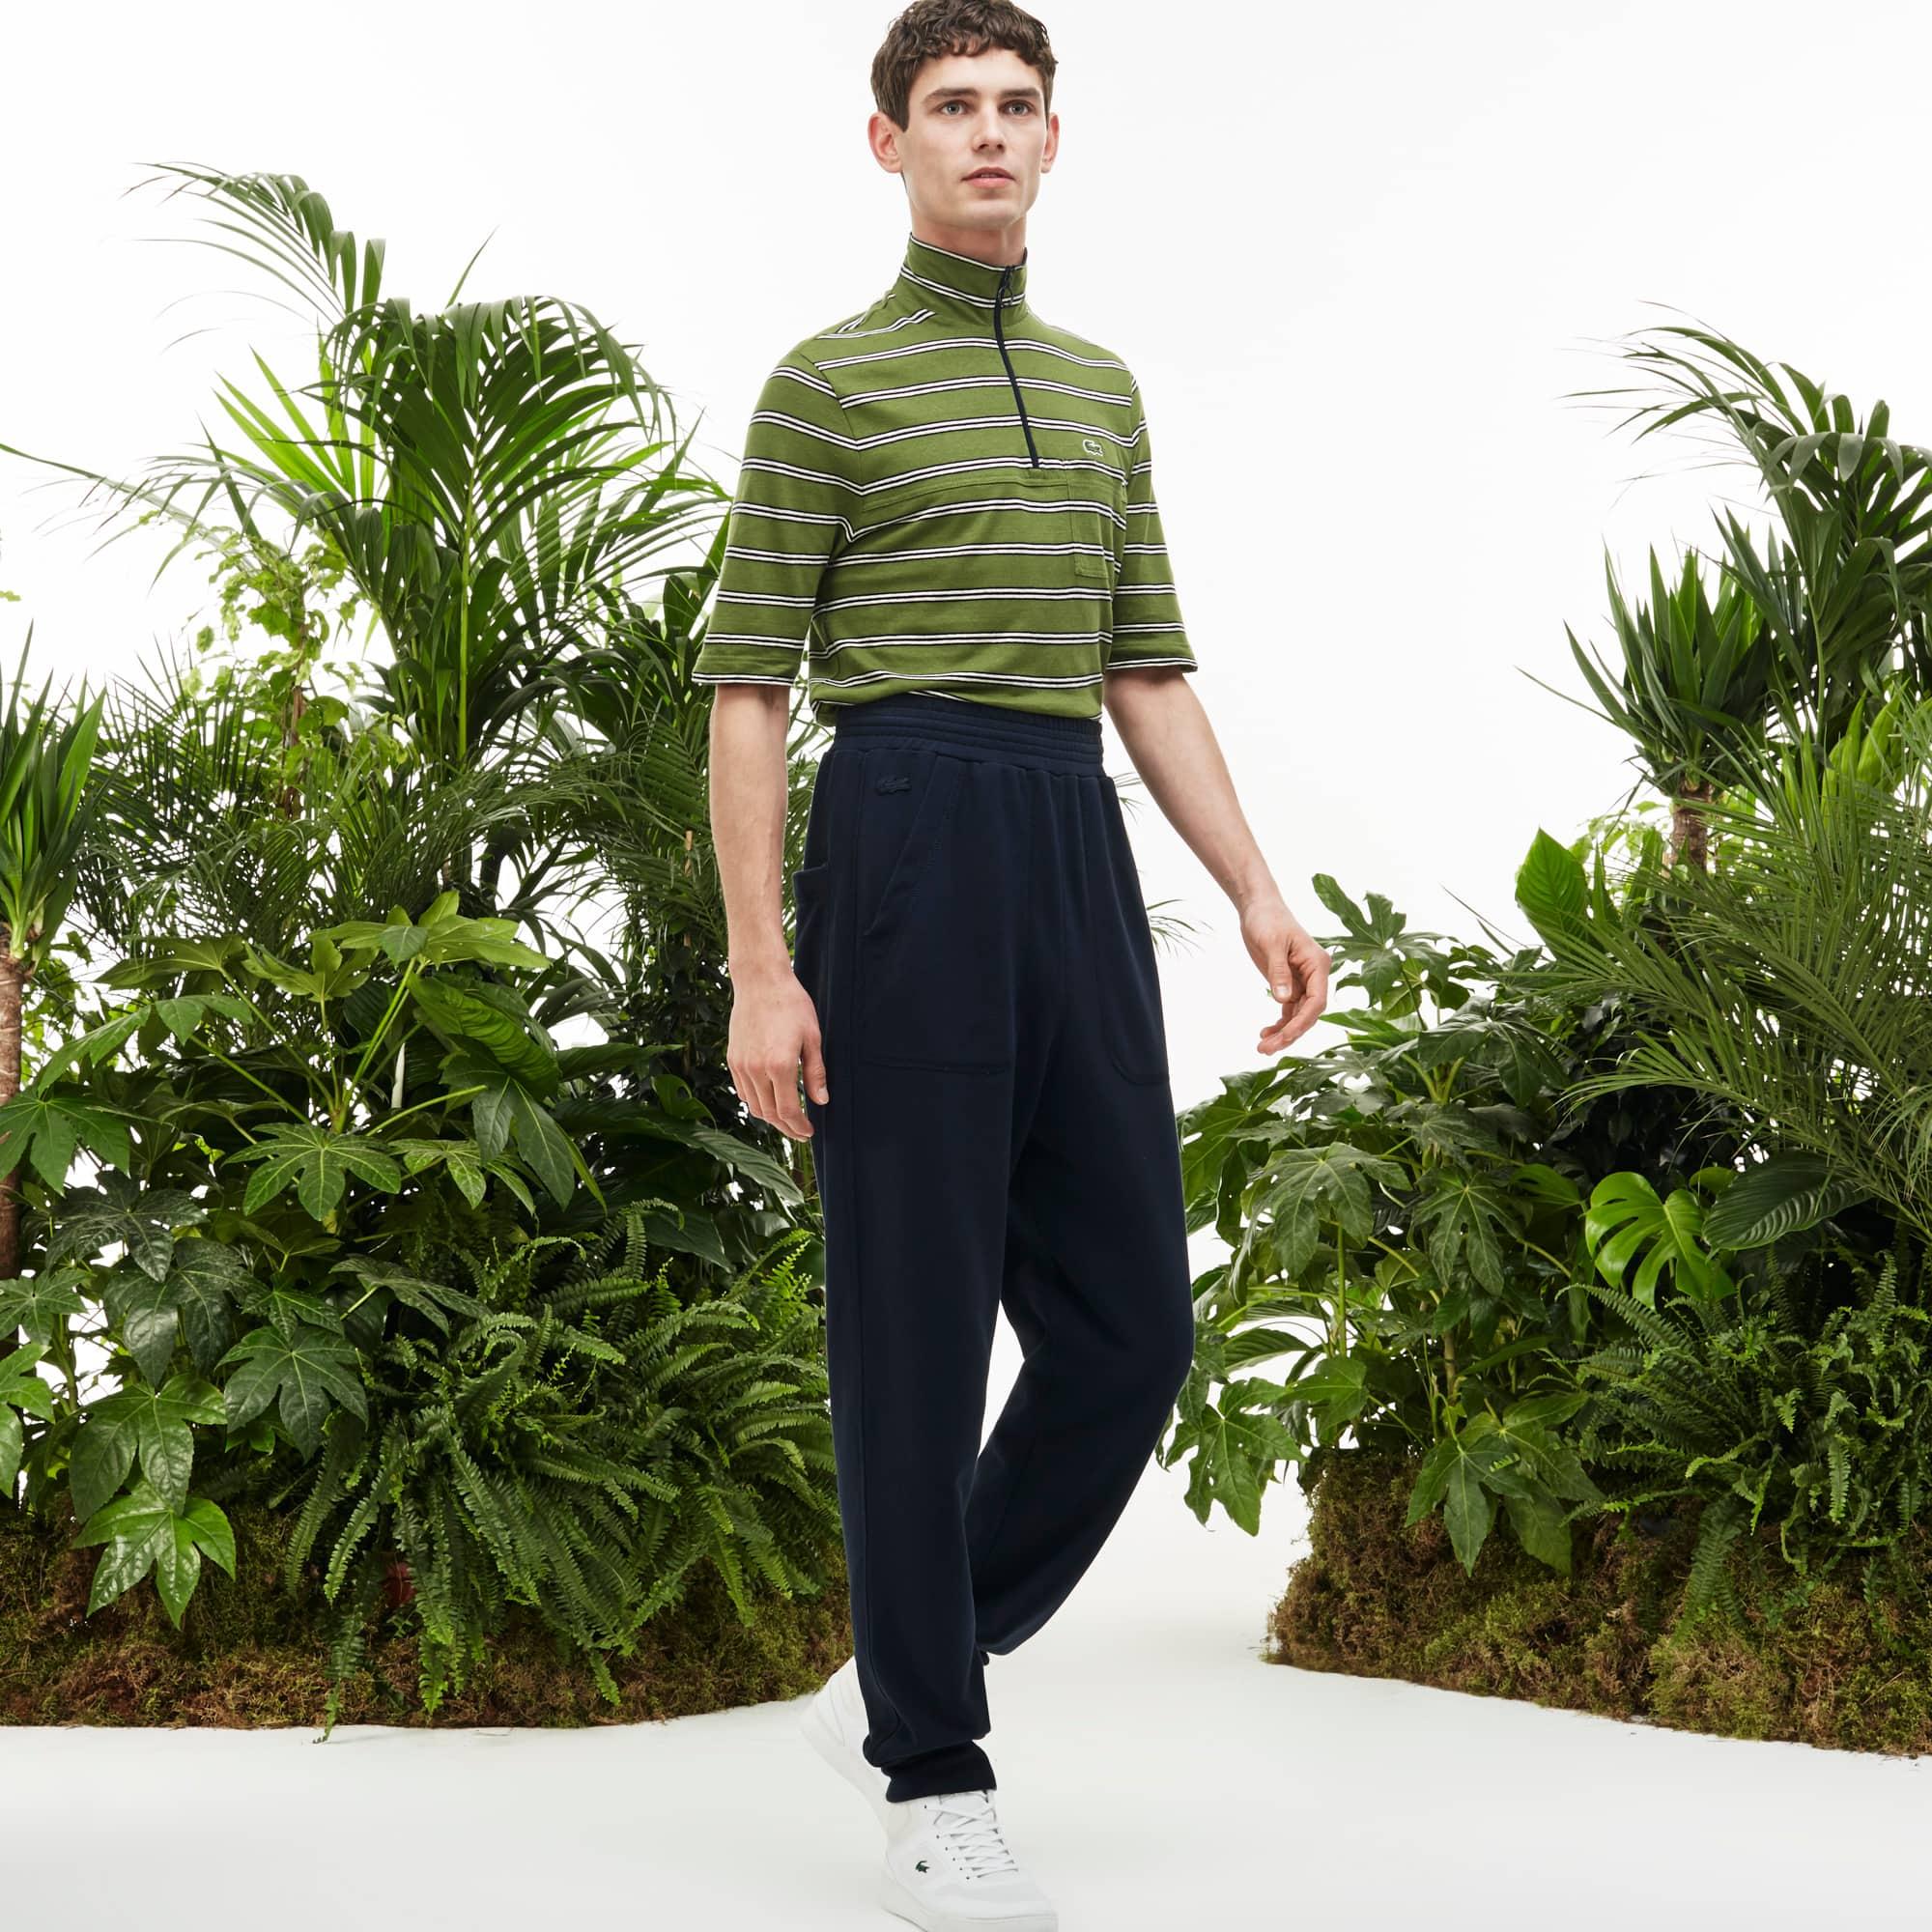 Men's Fashion Show Flowing Fleece Trackpants